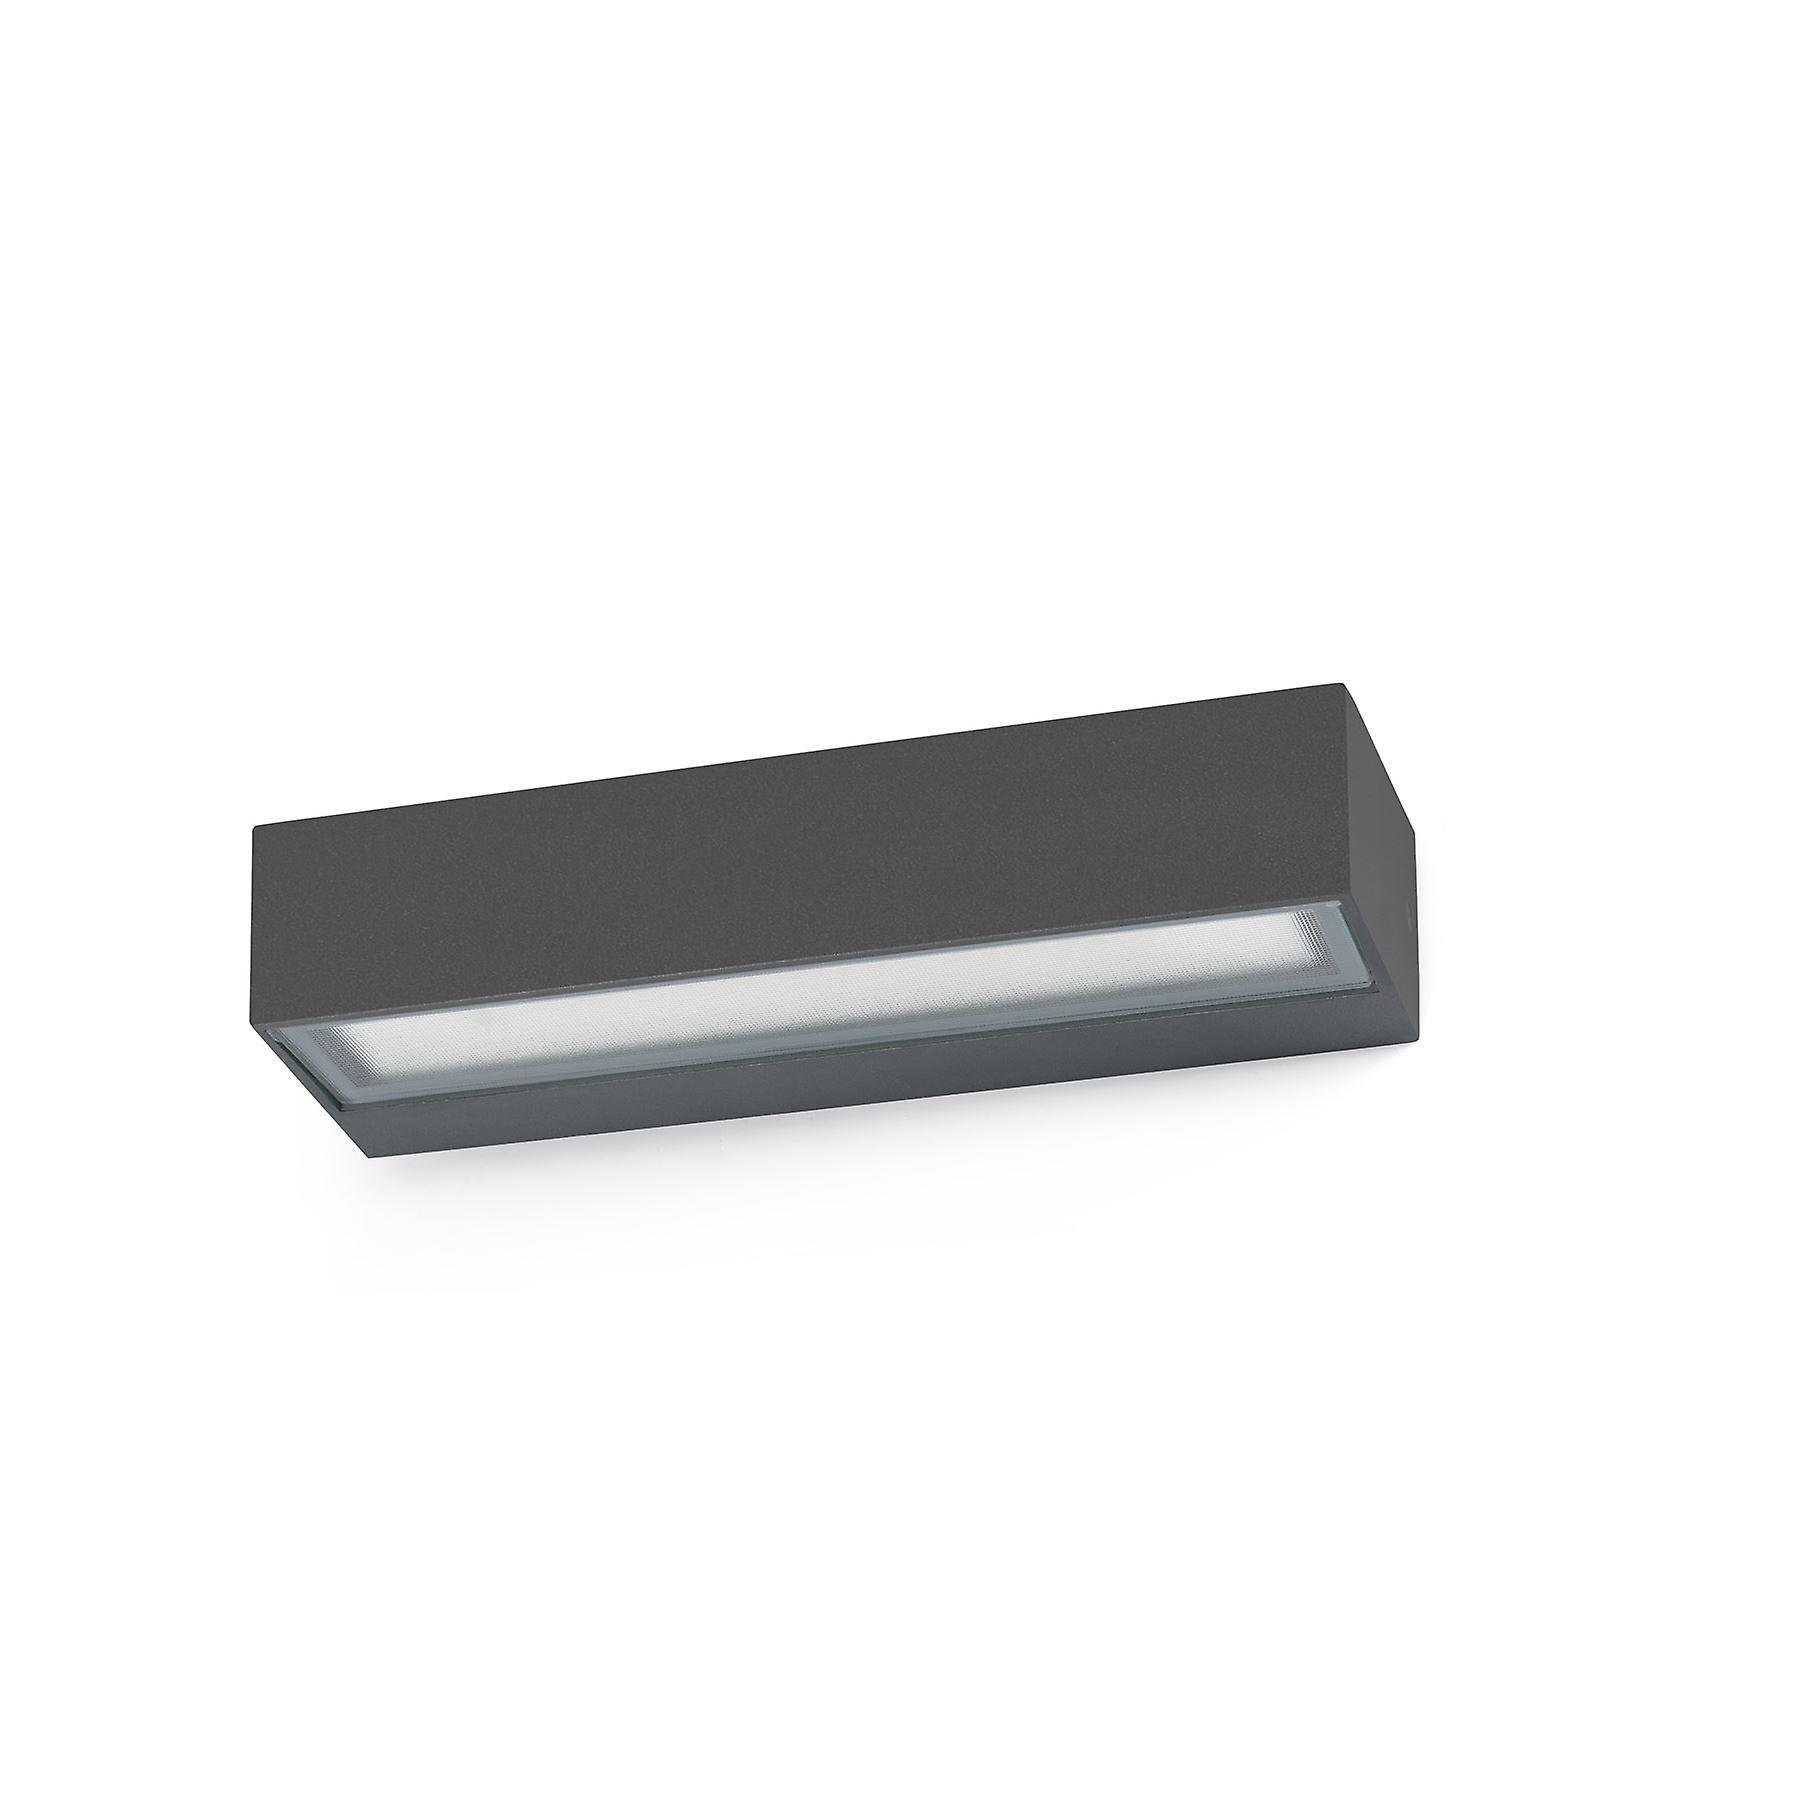 Faro - Toluca Dark gris LED de plein air Wall lumière FARO71050